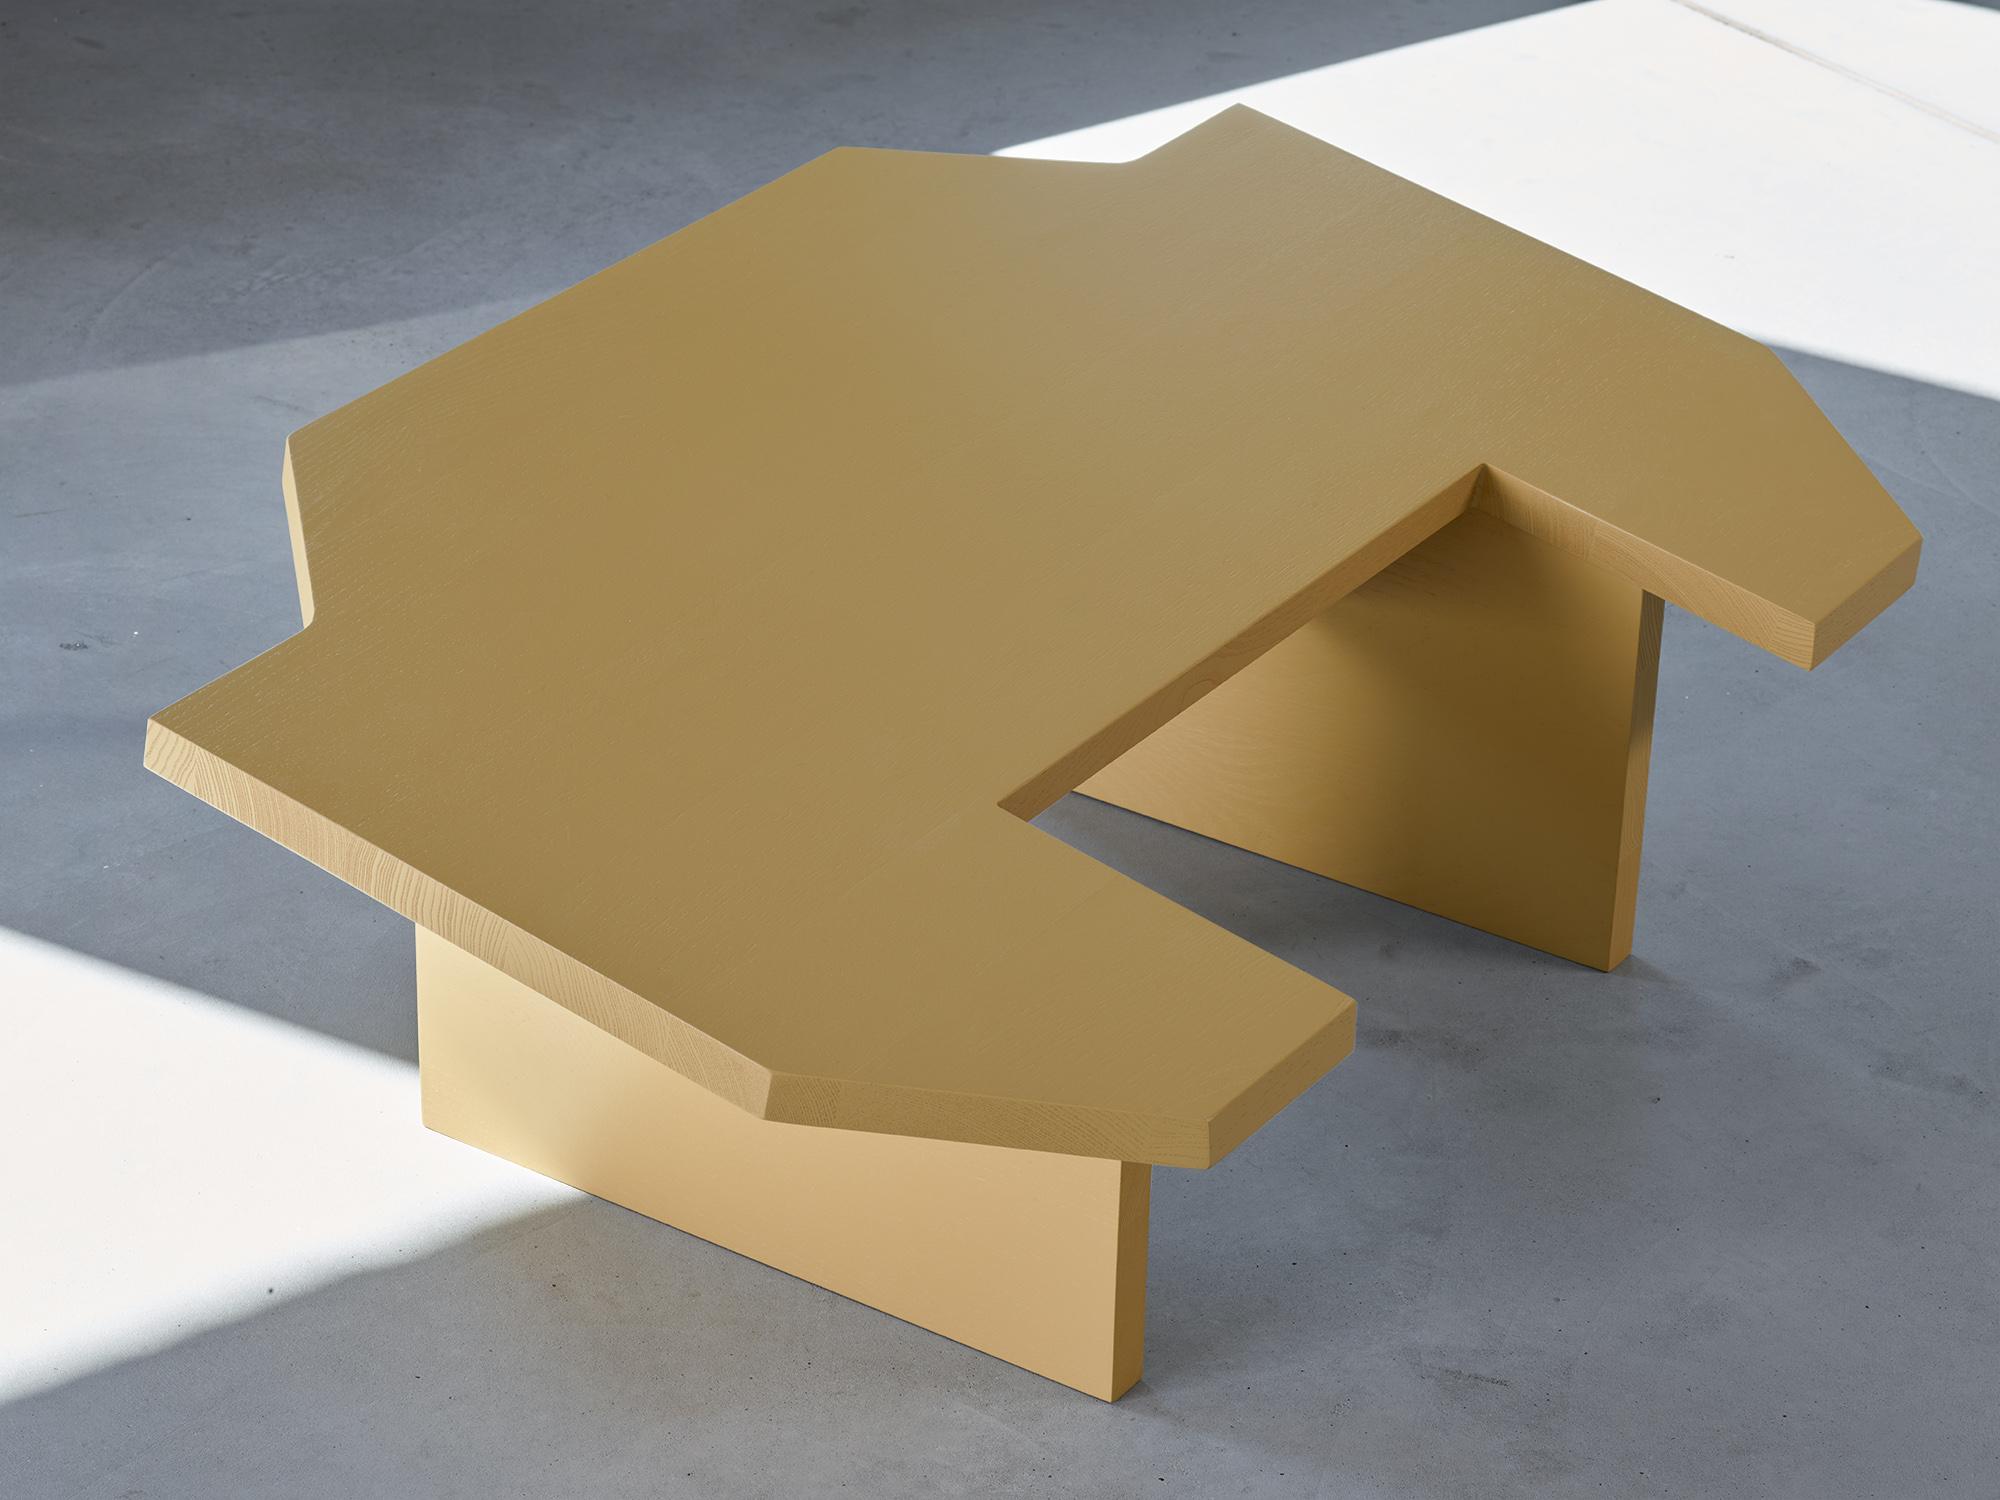 objekte-unserer-tage-3407-villa-06-takahashi-lounge-chair